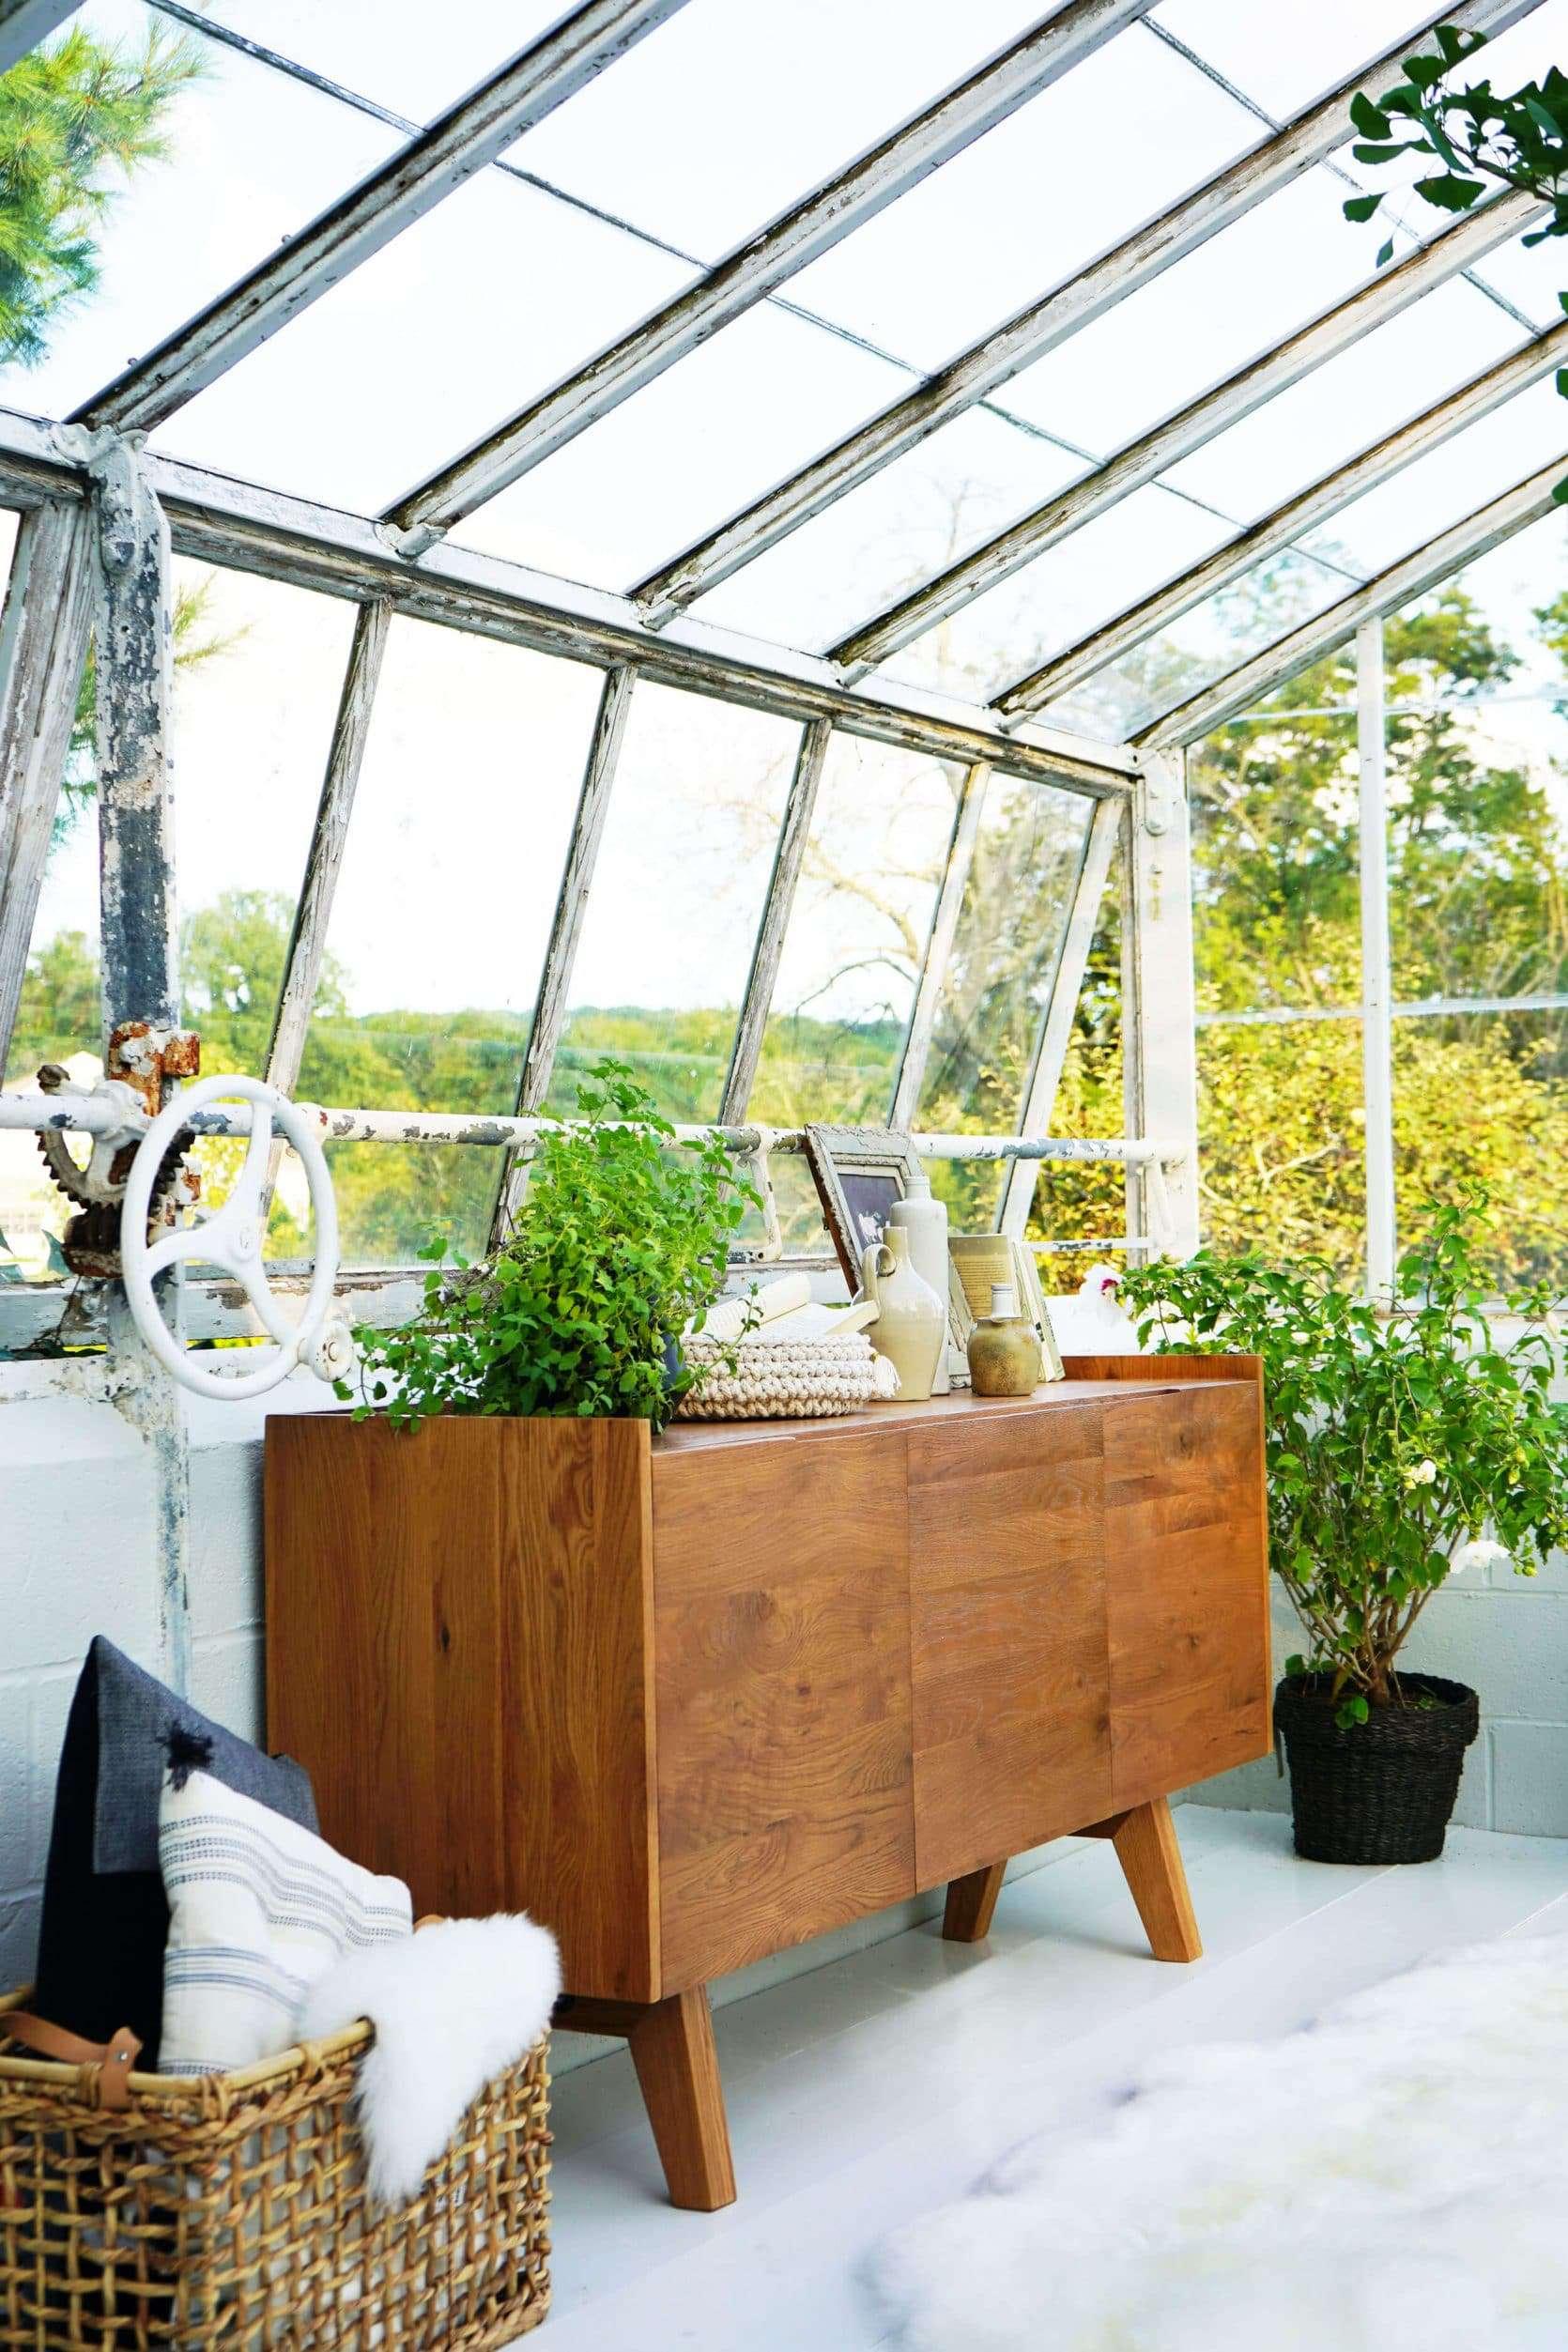 Emily Henderson Samsung The Frame My Scandinavian Home Greenhouse 13